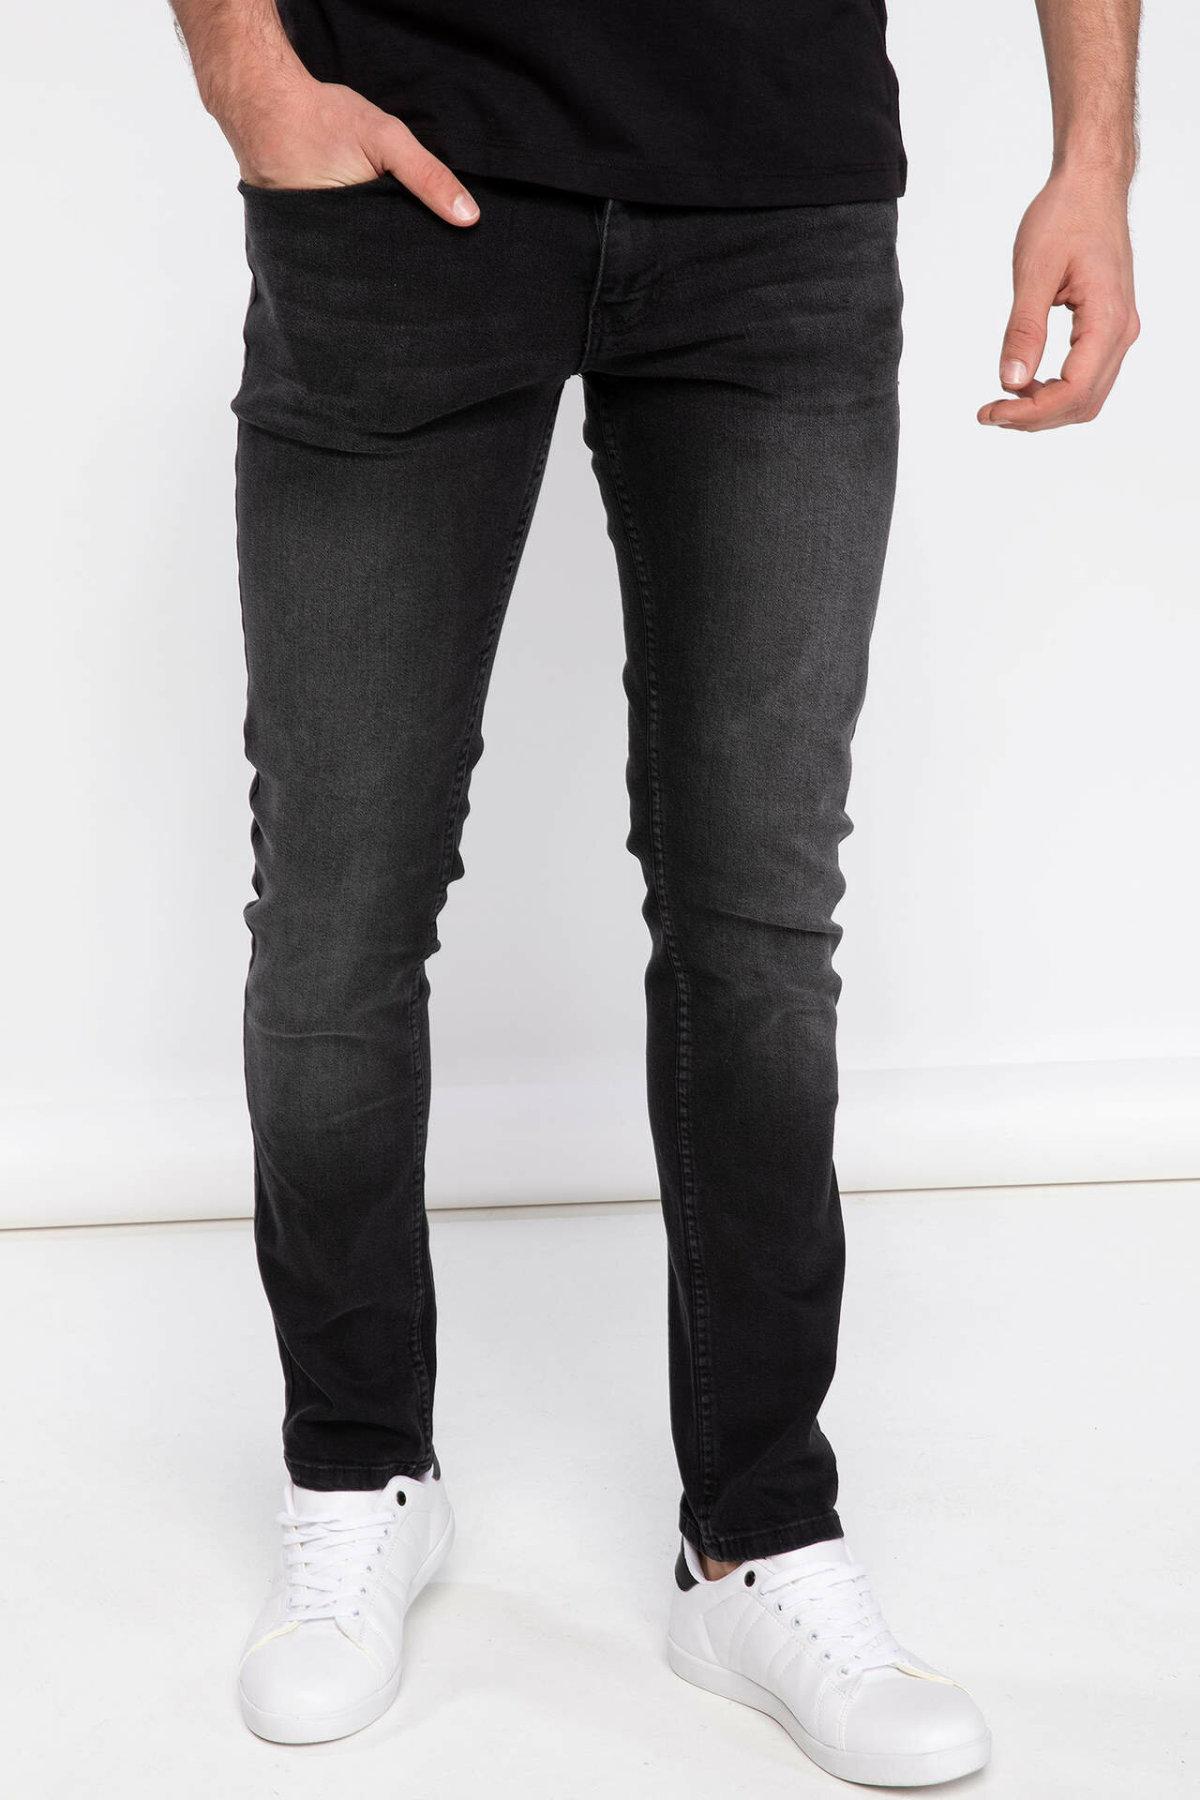 DeFacto Man Spring Black Denim Jeans Men Casual Skinny Denim Pants Male Mid-waist Denim Trousers-K4108AZ19SP